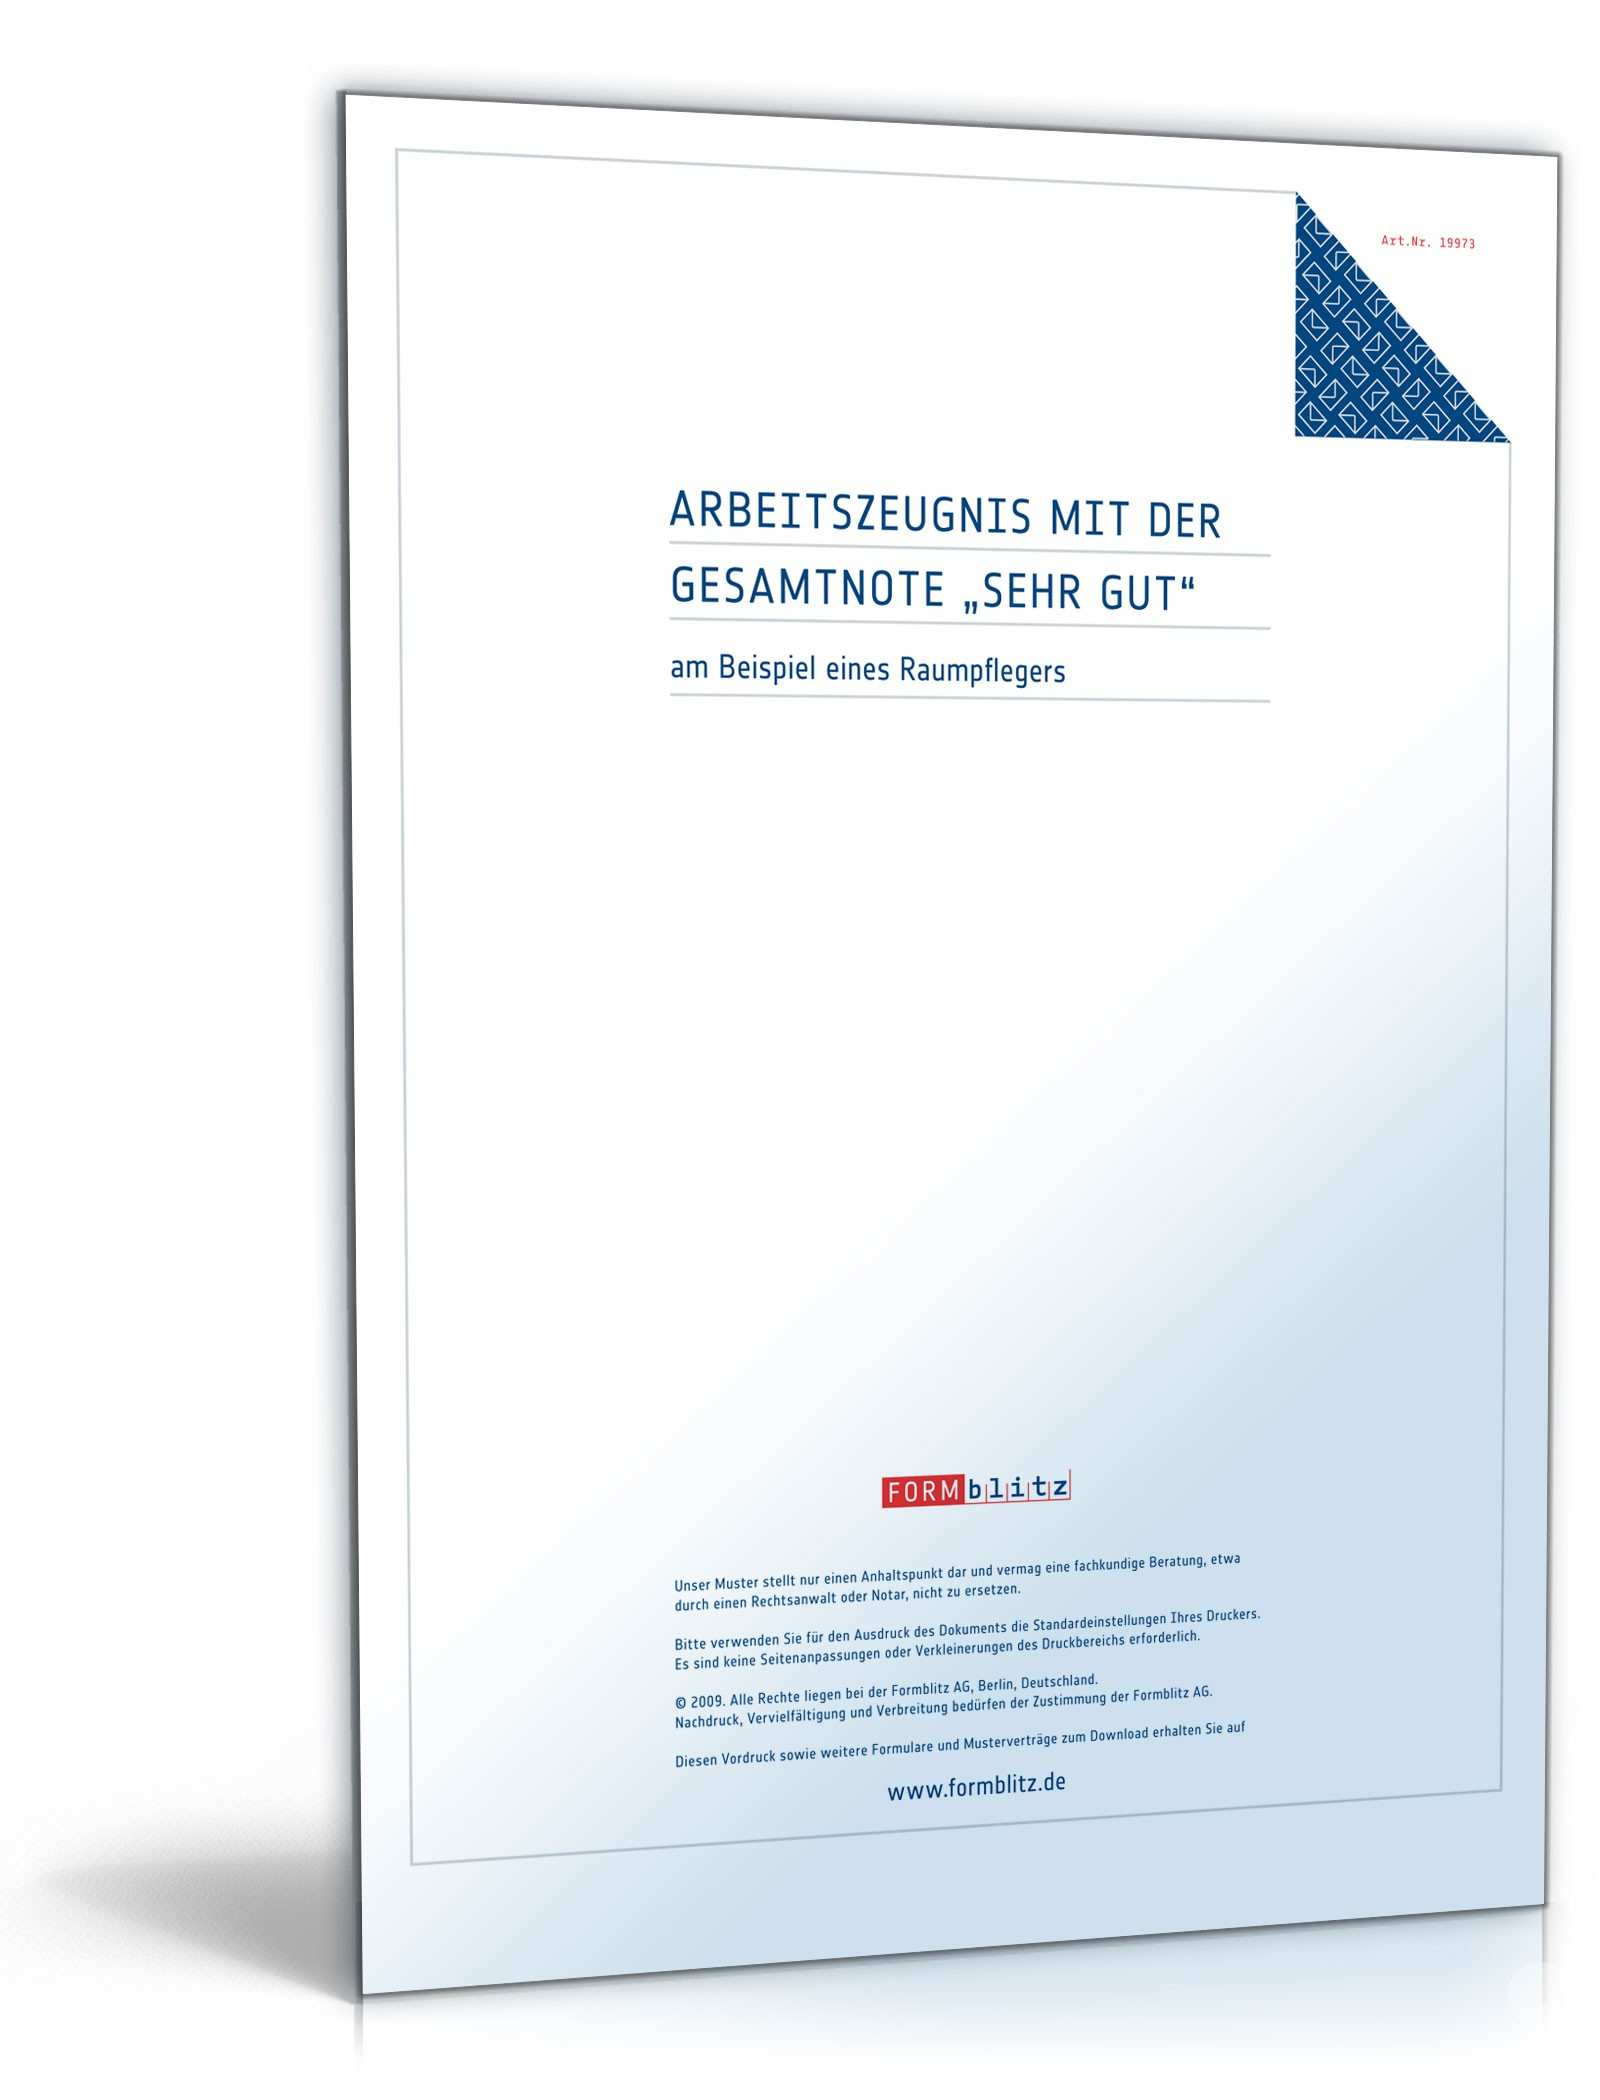 Arbeitszeugnis Raumpflegerin Rechtssichere Muster Downloaden